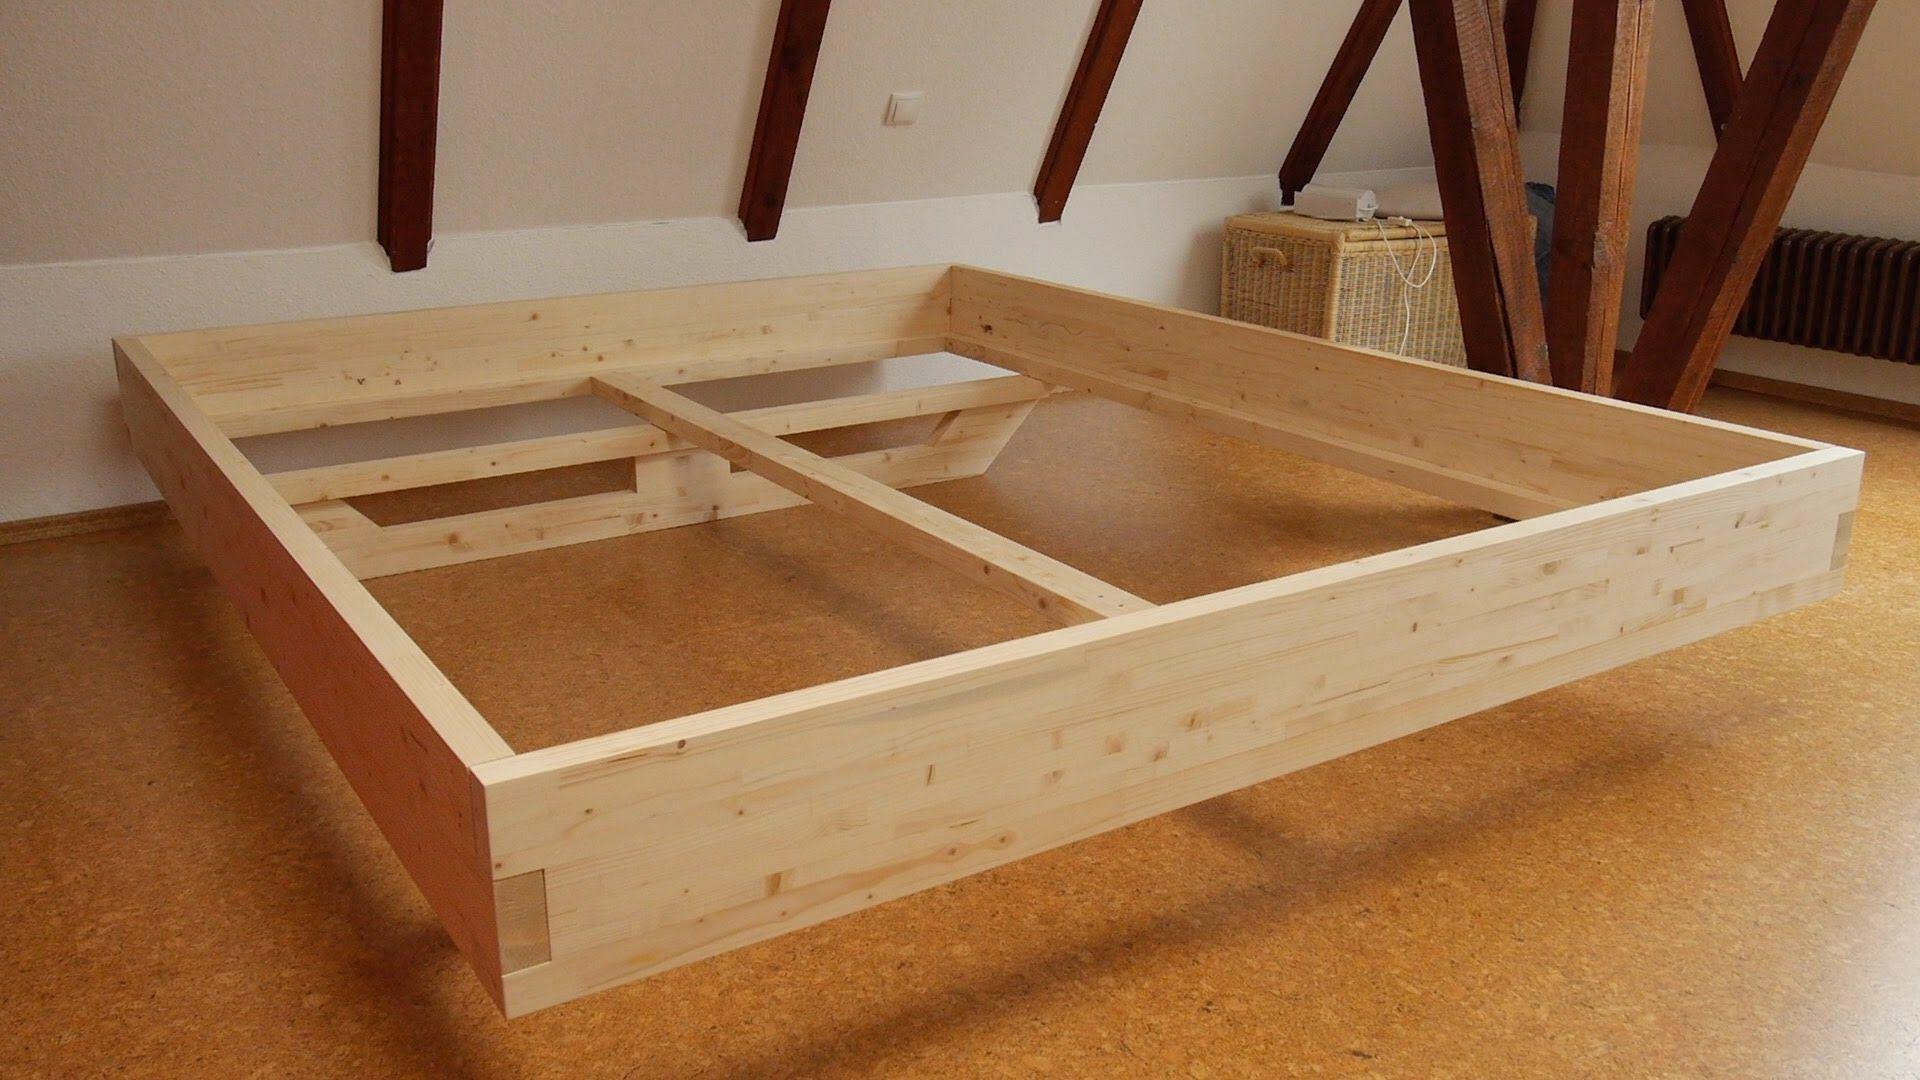 diy massivholz-bett selber bauen (woodworking bed) | woodworking